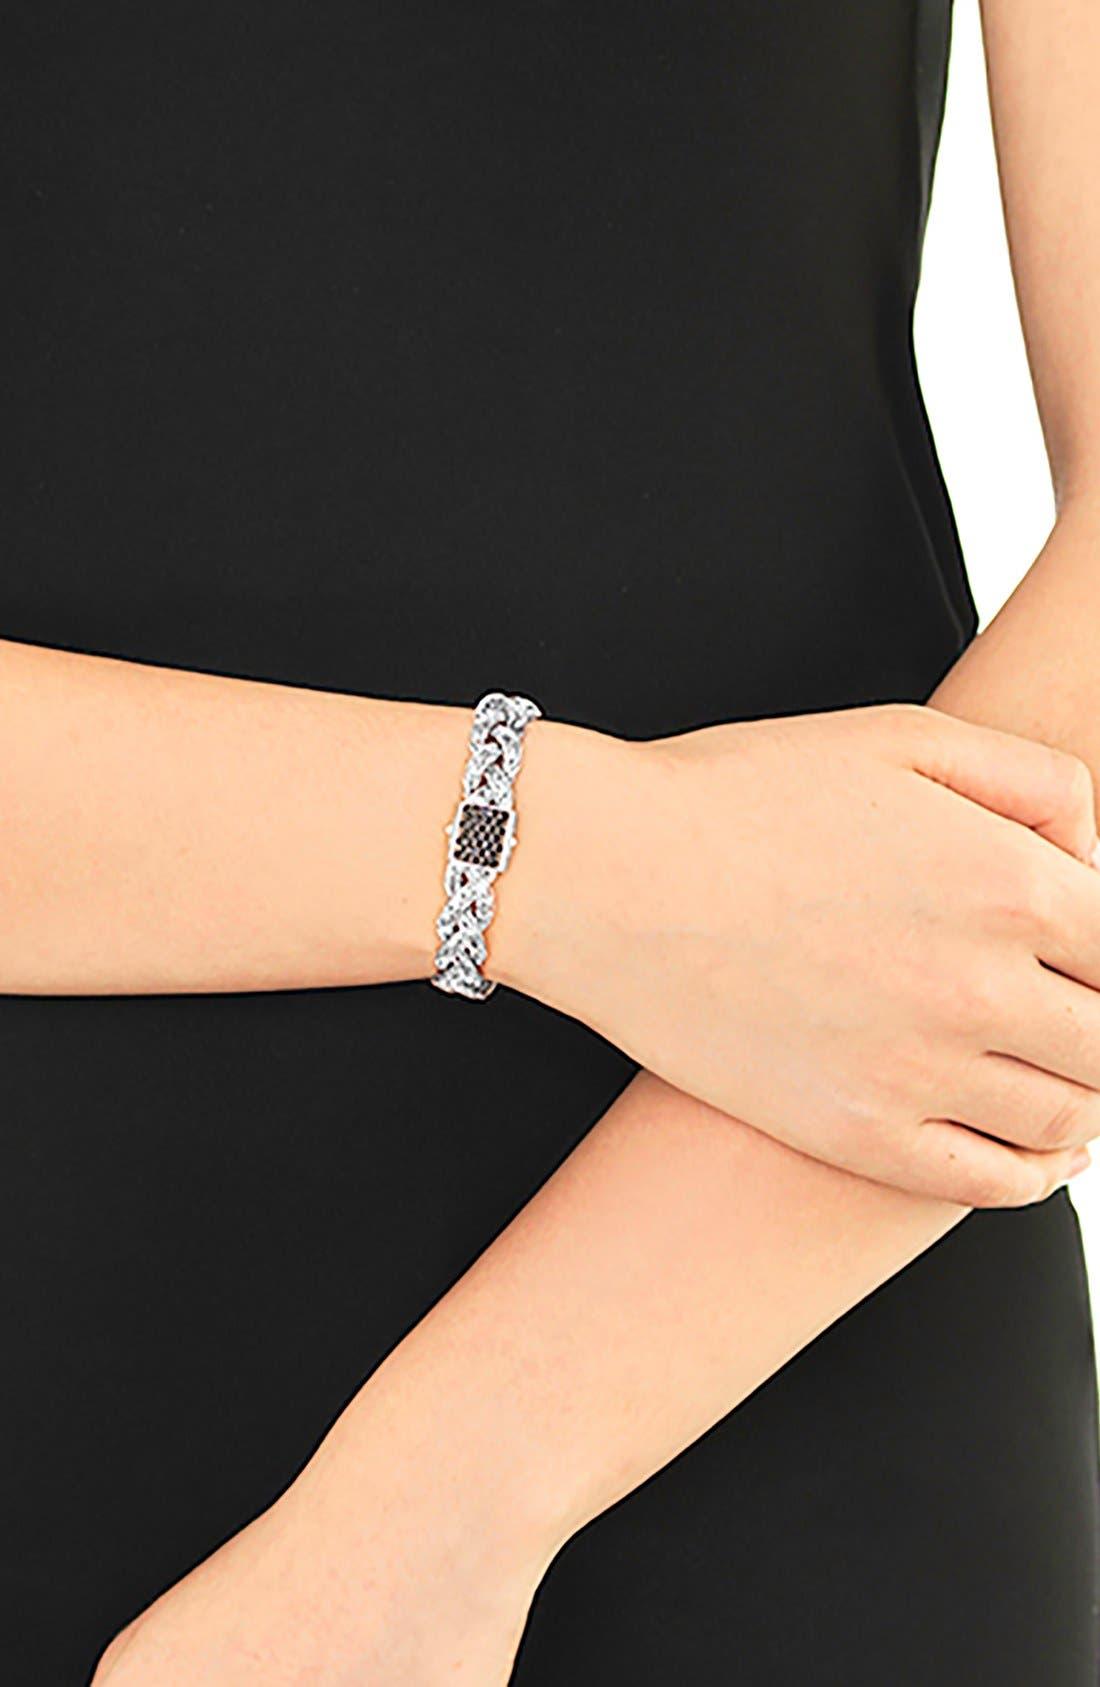 'Braided Chain' Semiprecious Stone Bracelet,                             Alternate thumbnail 2, color,                             Silver/ Black Sapphire